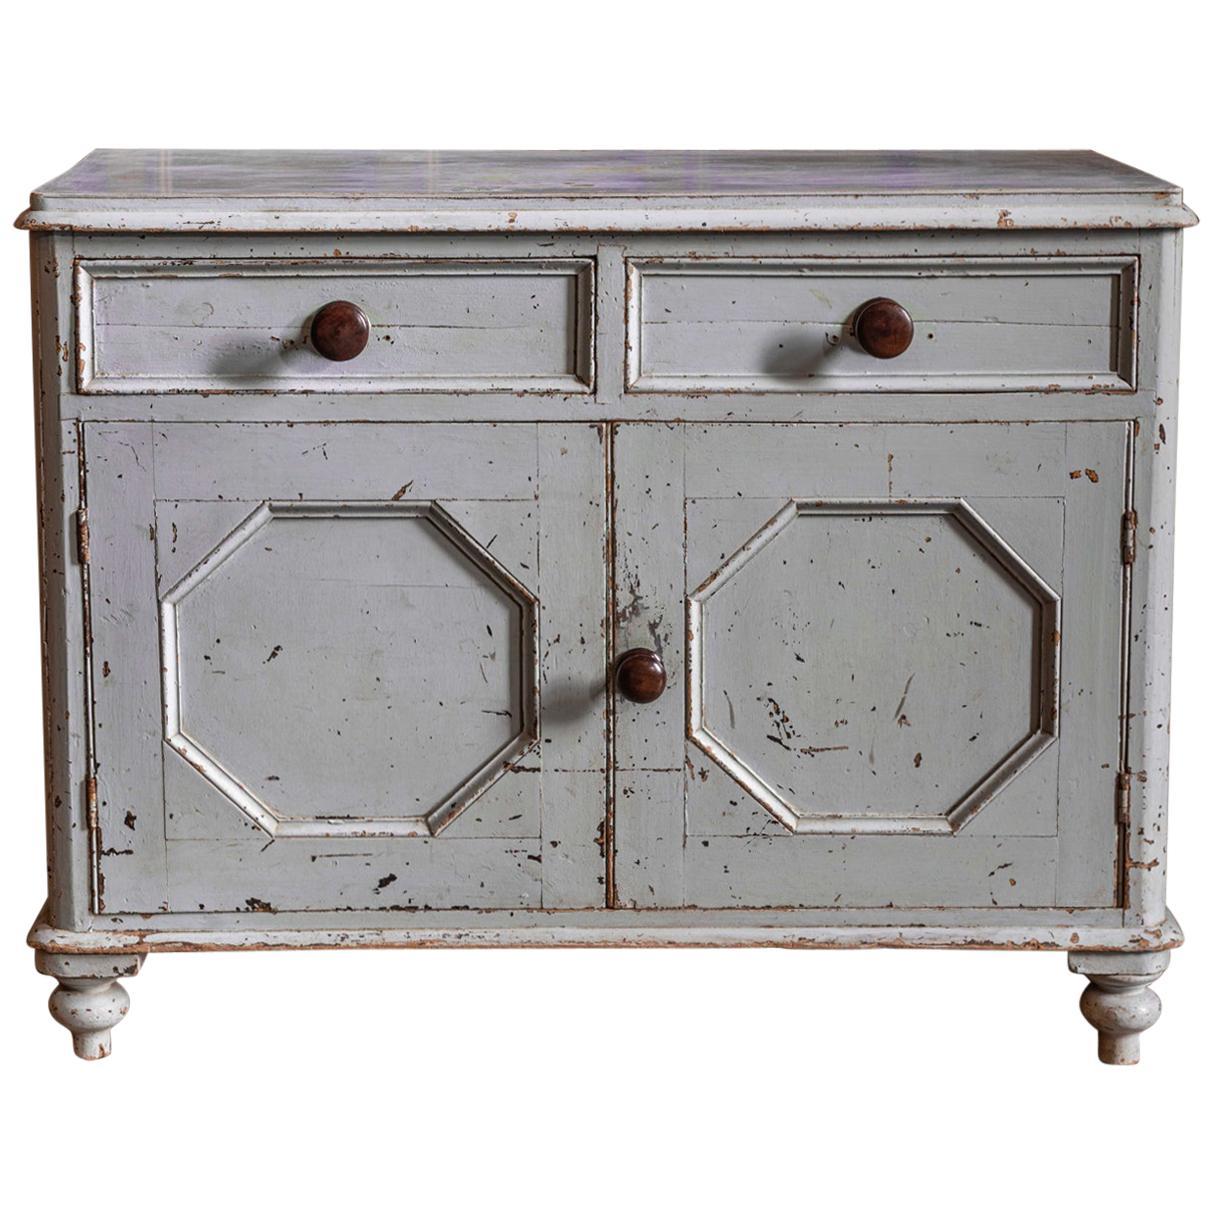 19th Century English Painted Pine Dresser Base / Cupboard